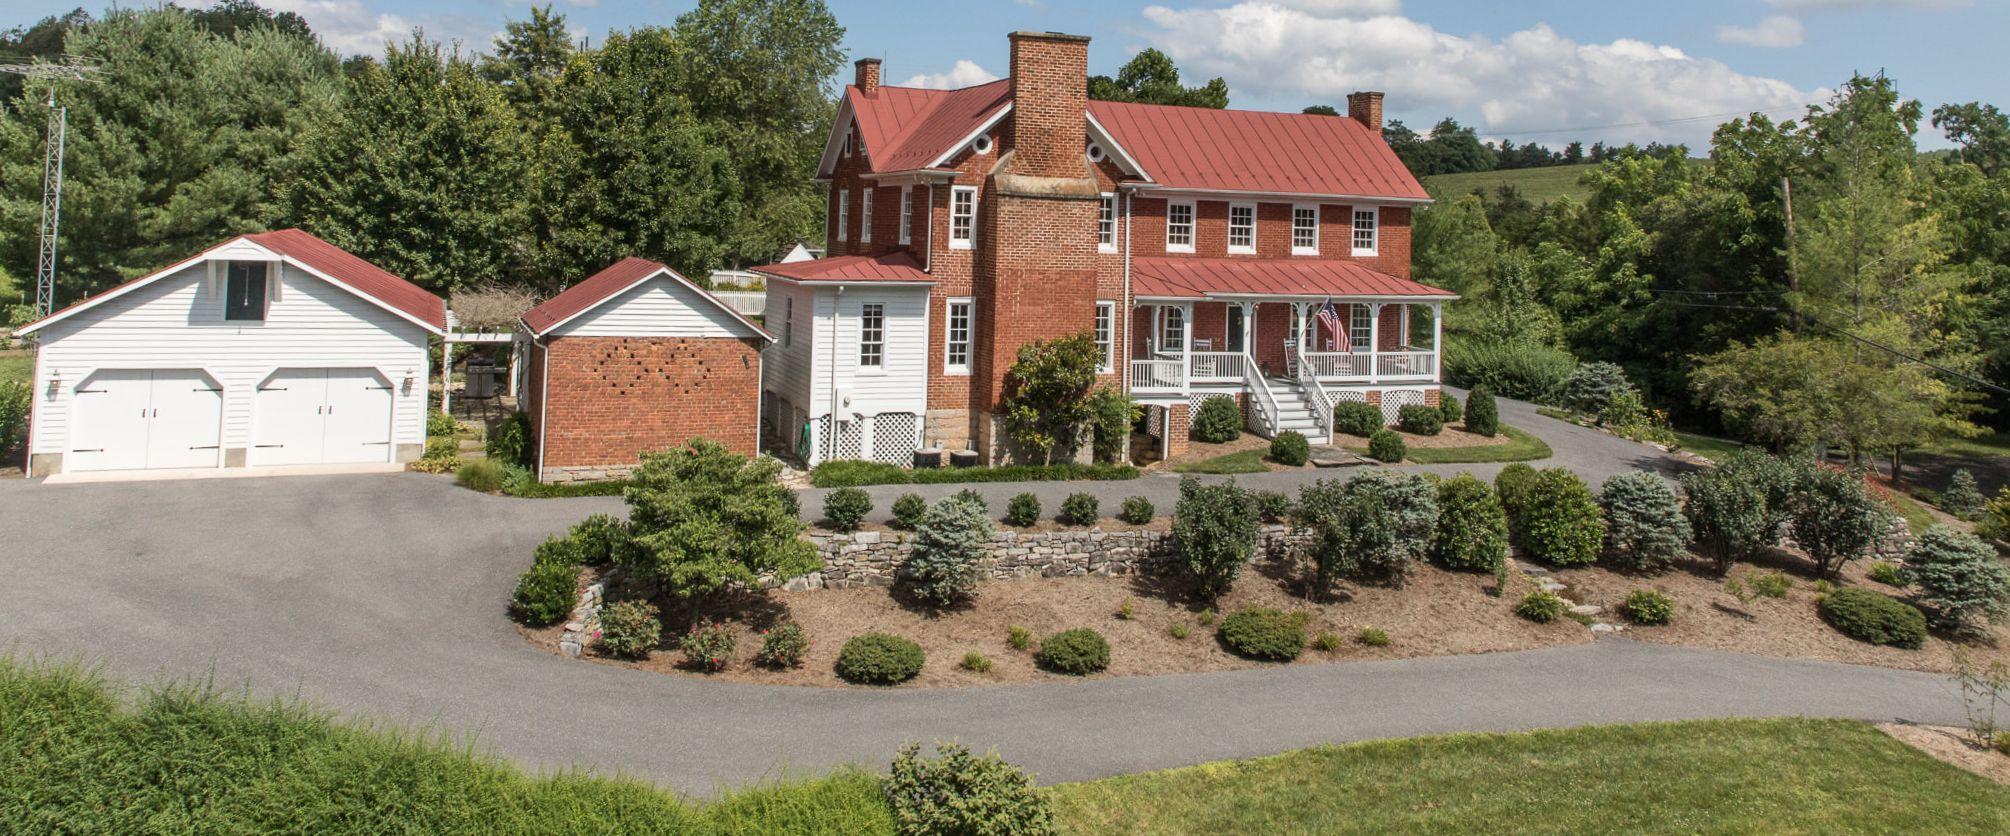 Real Estate Photographer Central Virginia - Residential